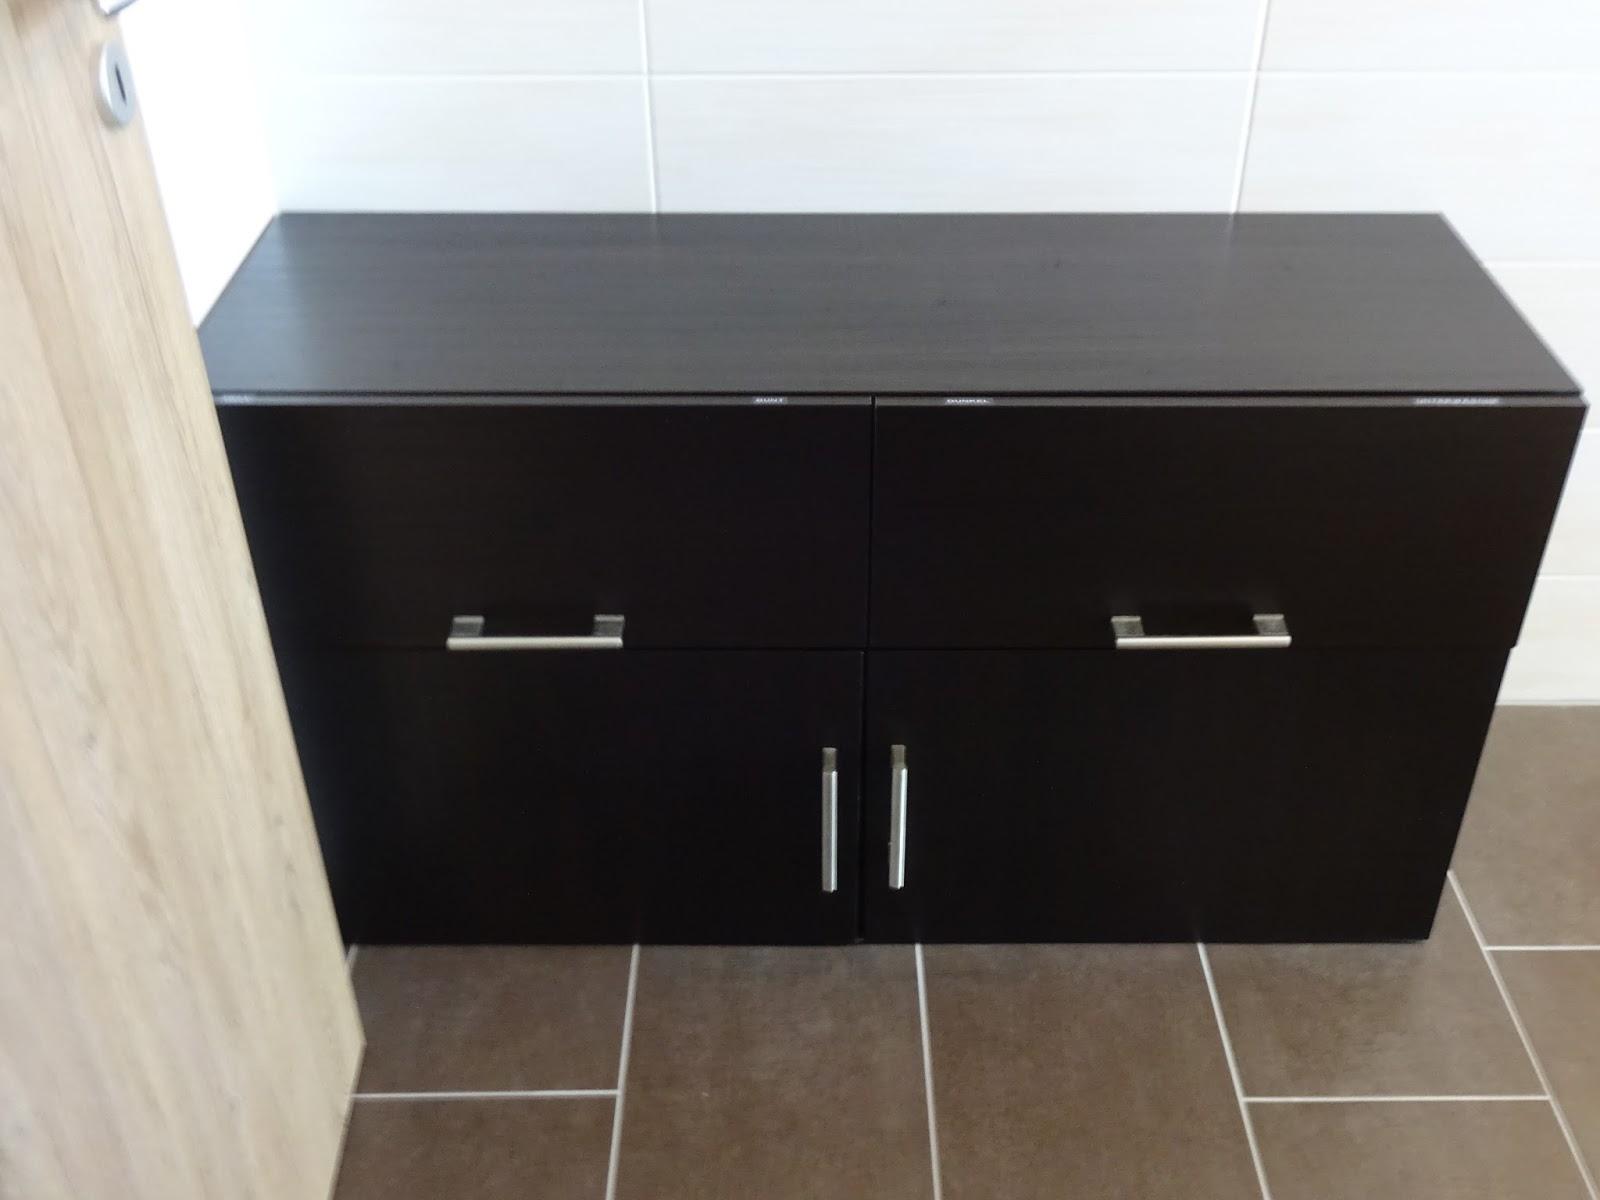 eckregal dusche kunststoff raum und m beldesign inspiration. Black Bedroom Furniture Sets. Home Design Ideas